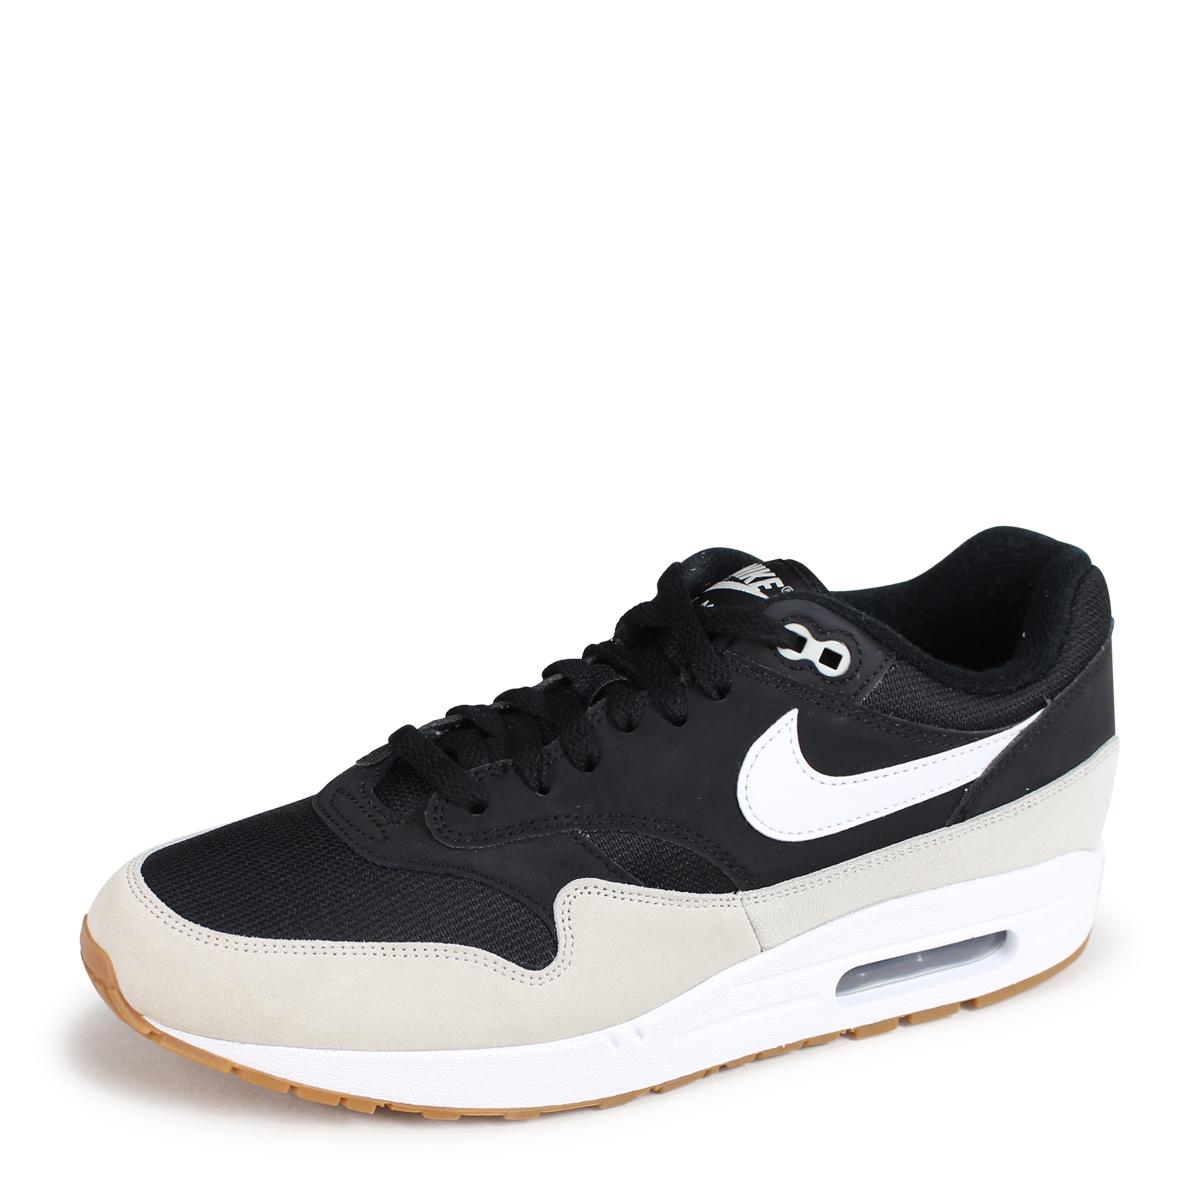 sale retailer 769dc 60344 NIKE AIR MAX 1 Kie Ney AMAX 1 sneakers men AH8145-009 black  10 22 Shinnyu  load   1810